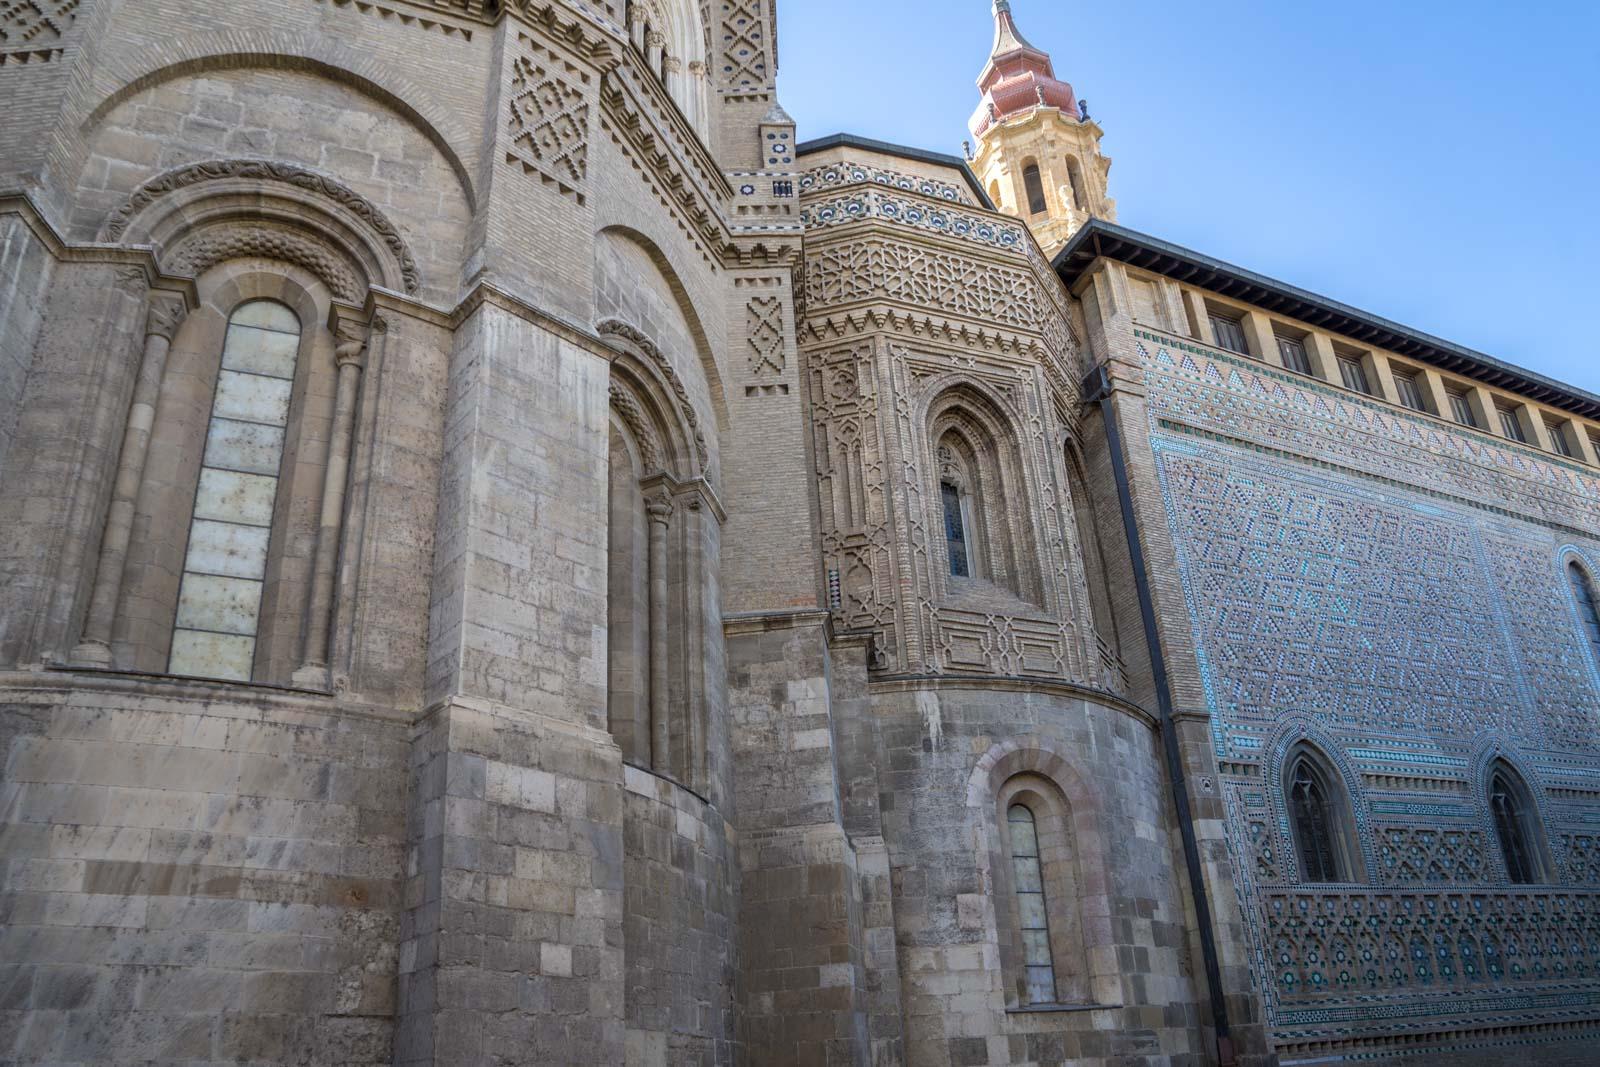 La Seo, Zaragoza, Spain